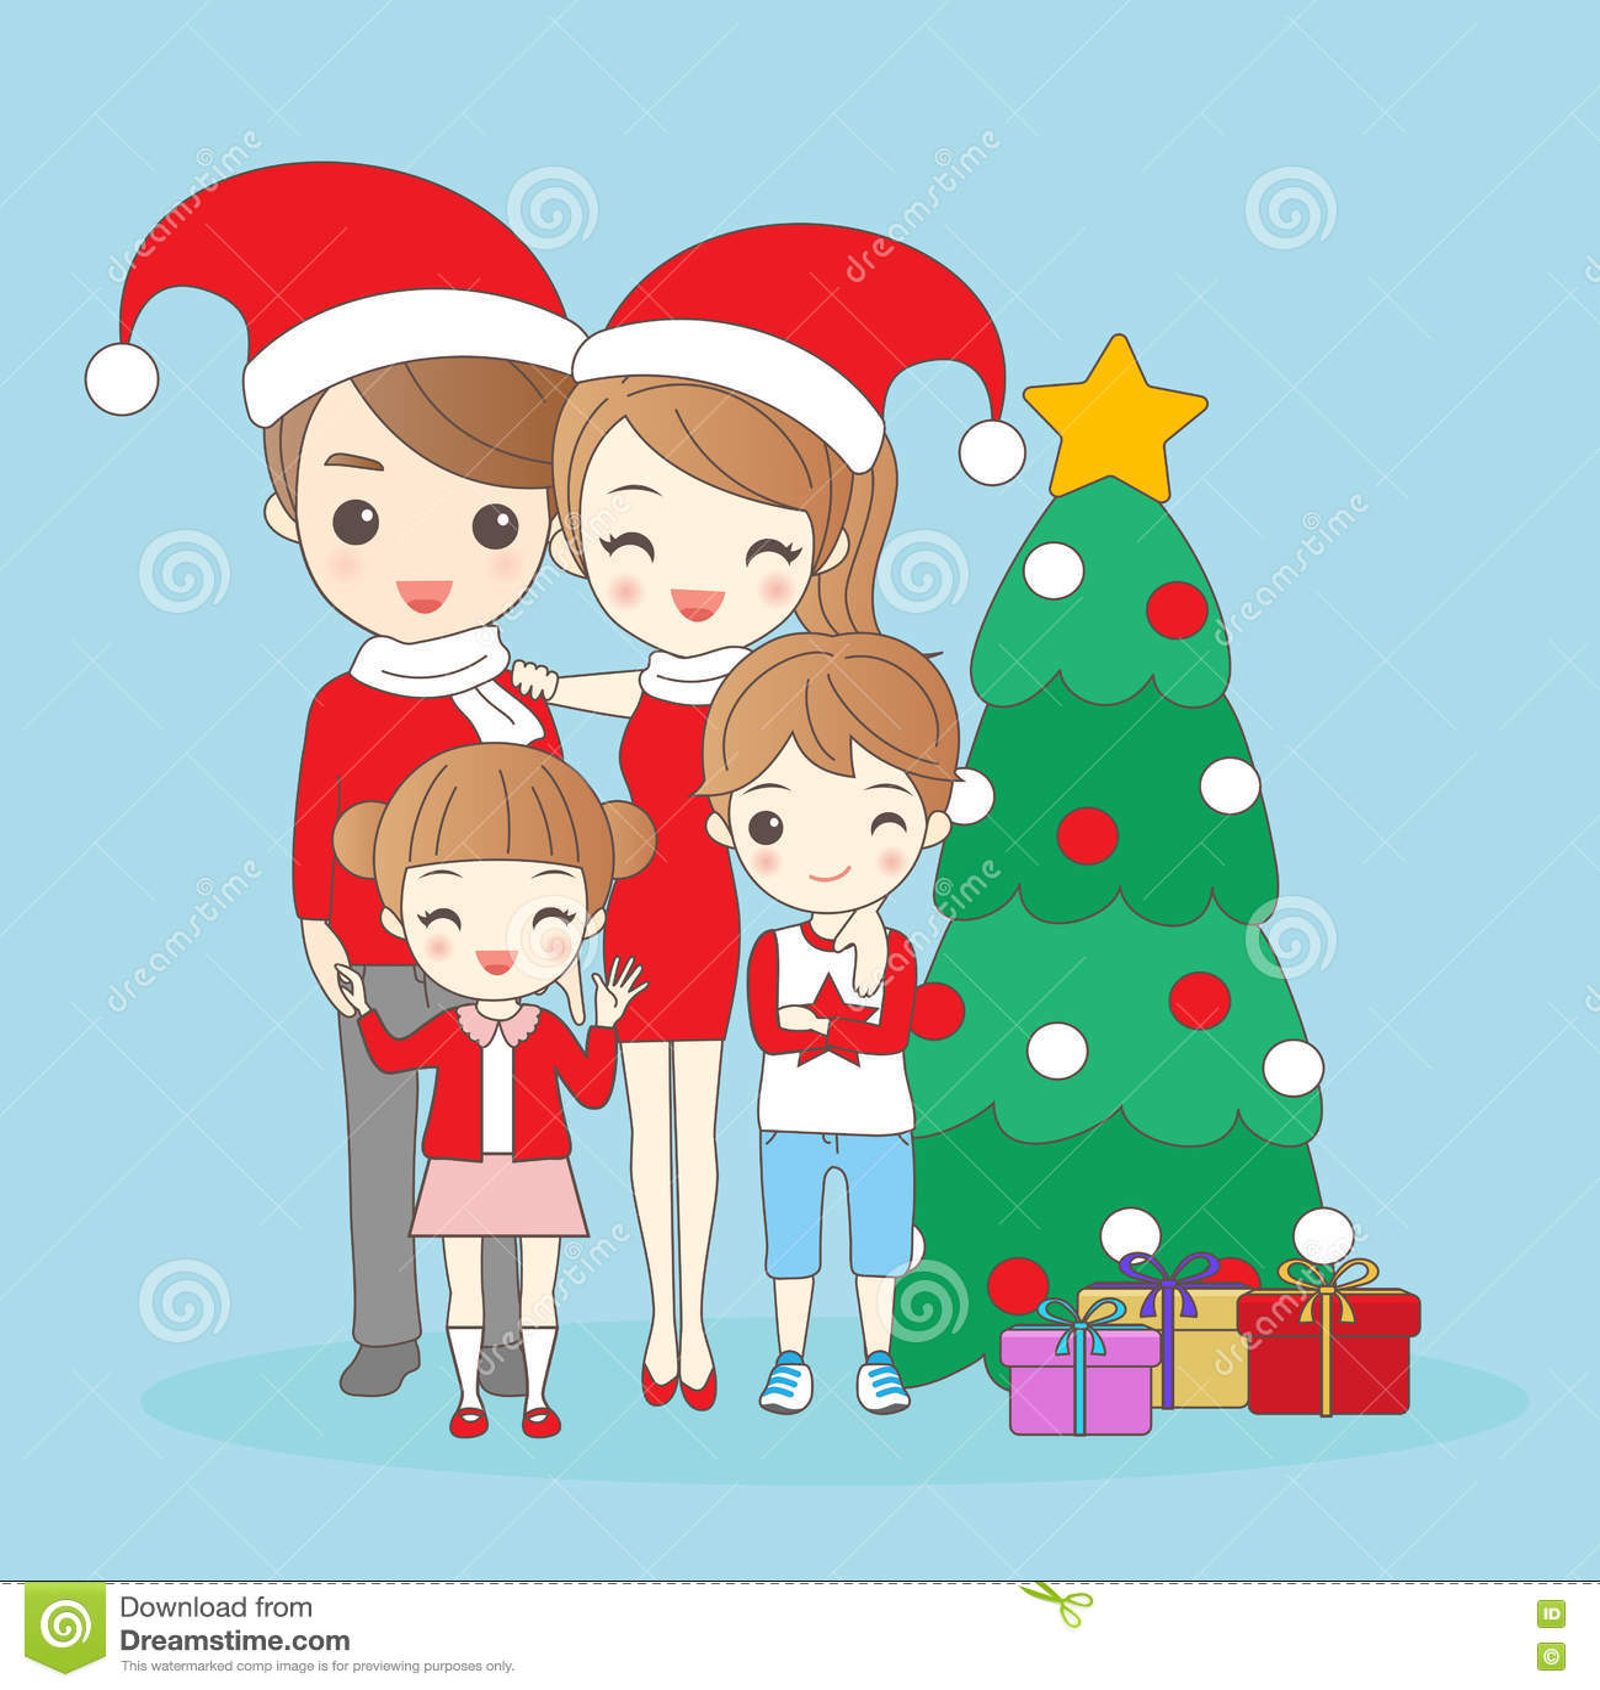 Christmas Cartoon Family Stock Illustrations 16 498 Christmas Cartoon Family Stock Illustrations Vectors Clipart Dreamstime